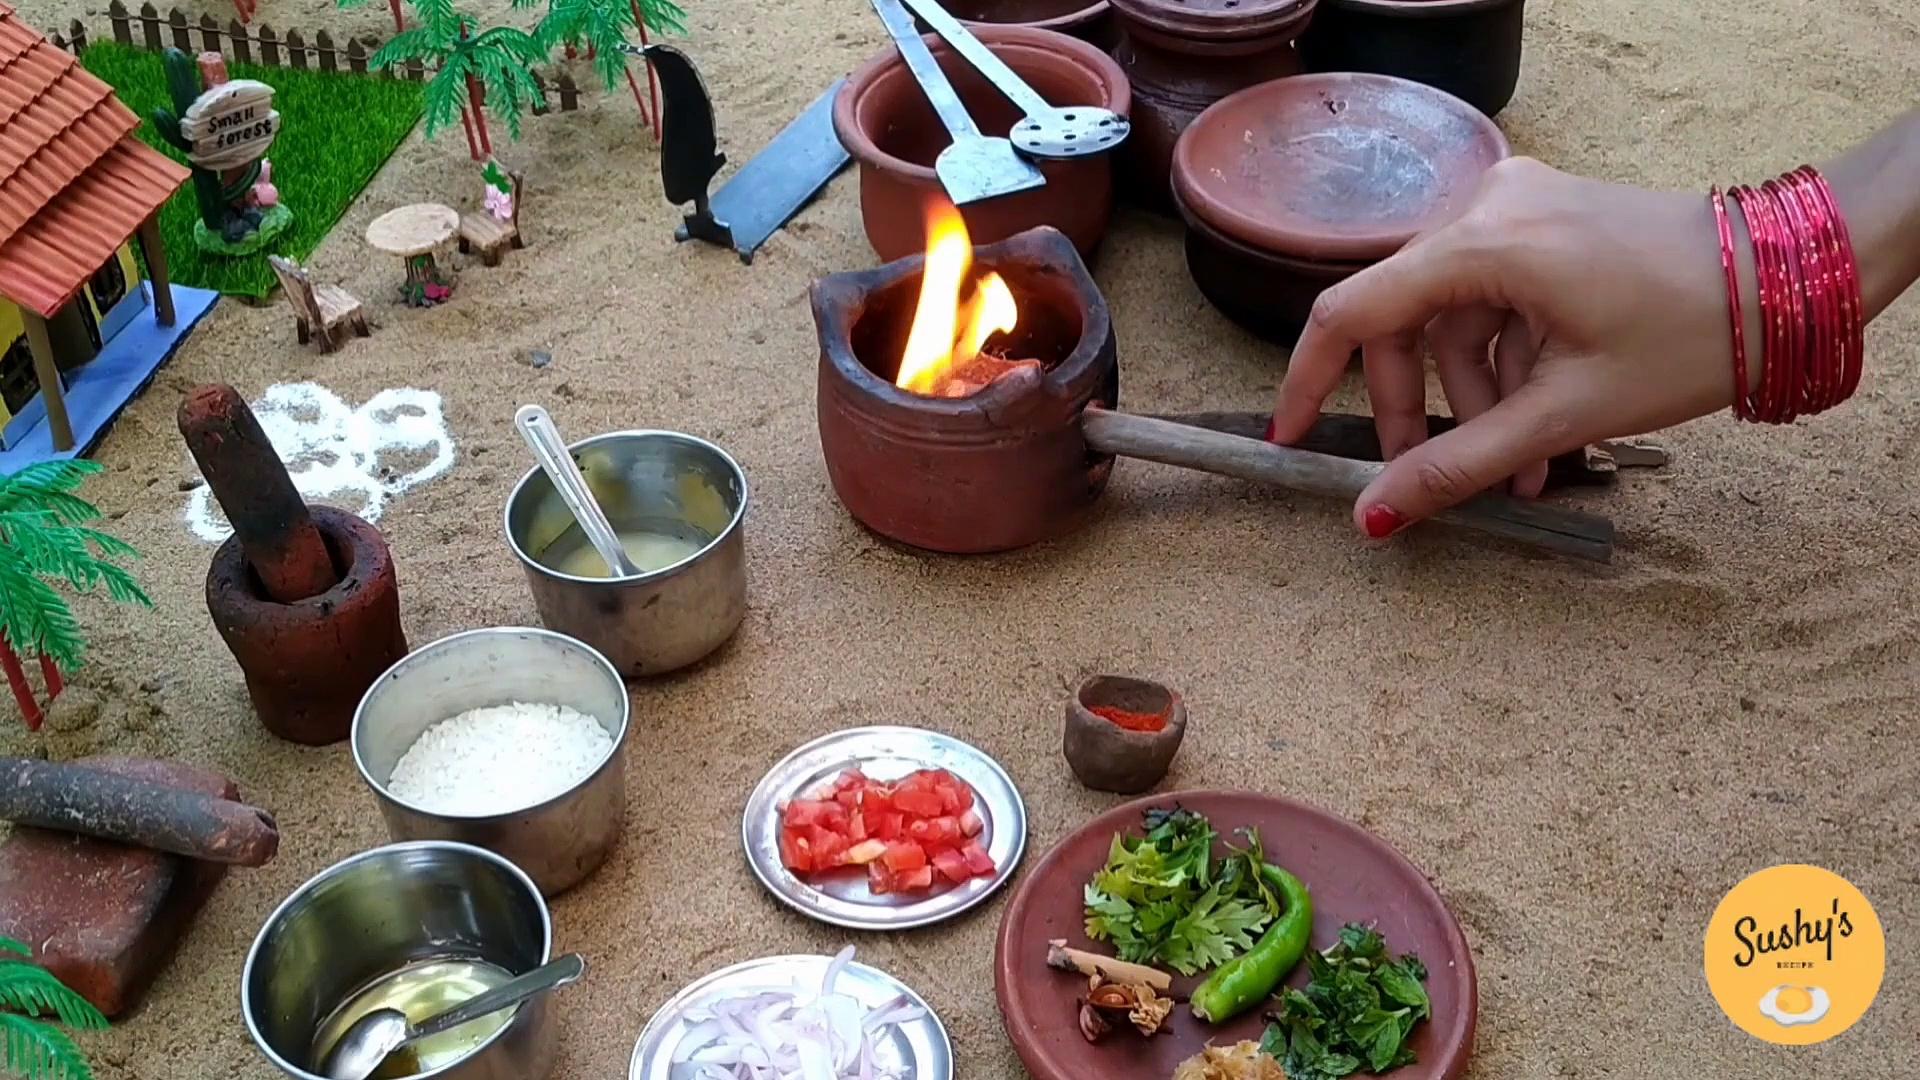 miniature prawn biryani recipe